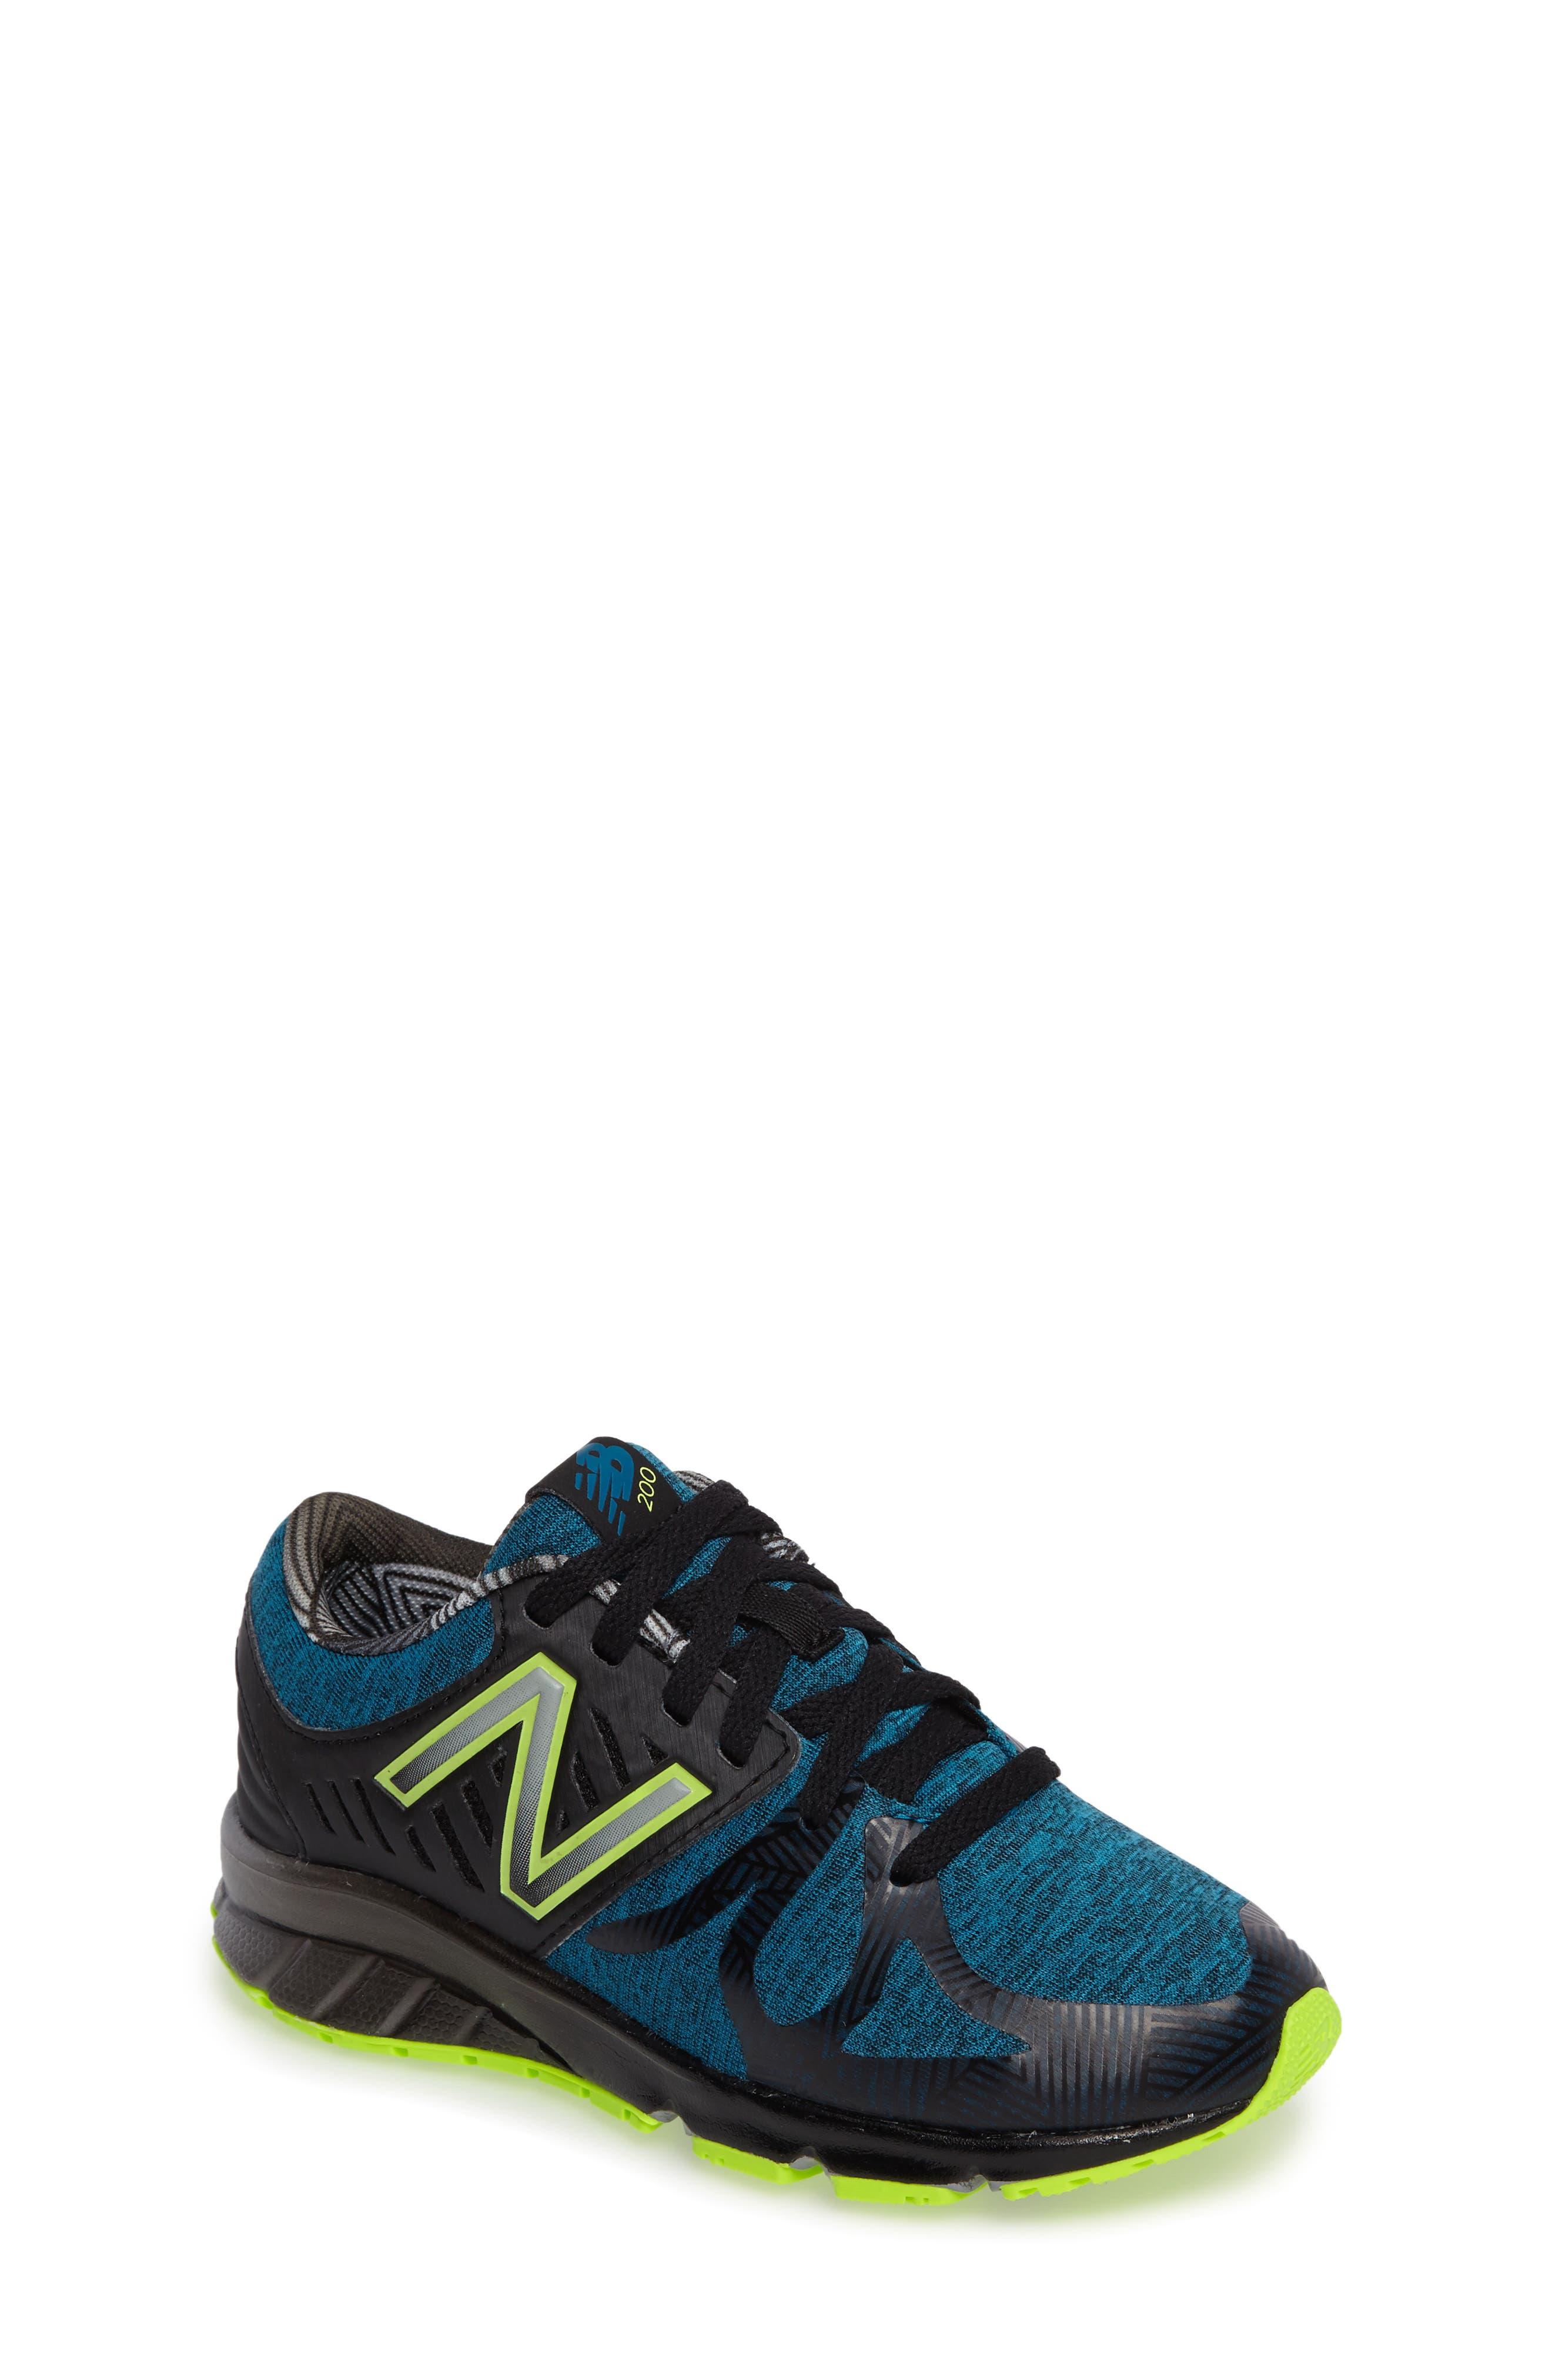 200 Electric Rainbow Athletic Shoe,                         Main,                         color, 407